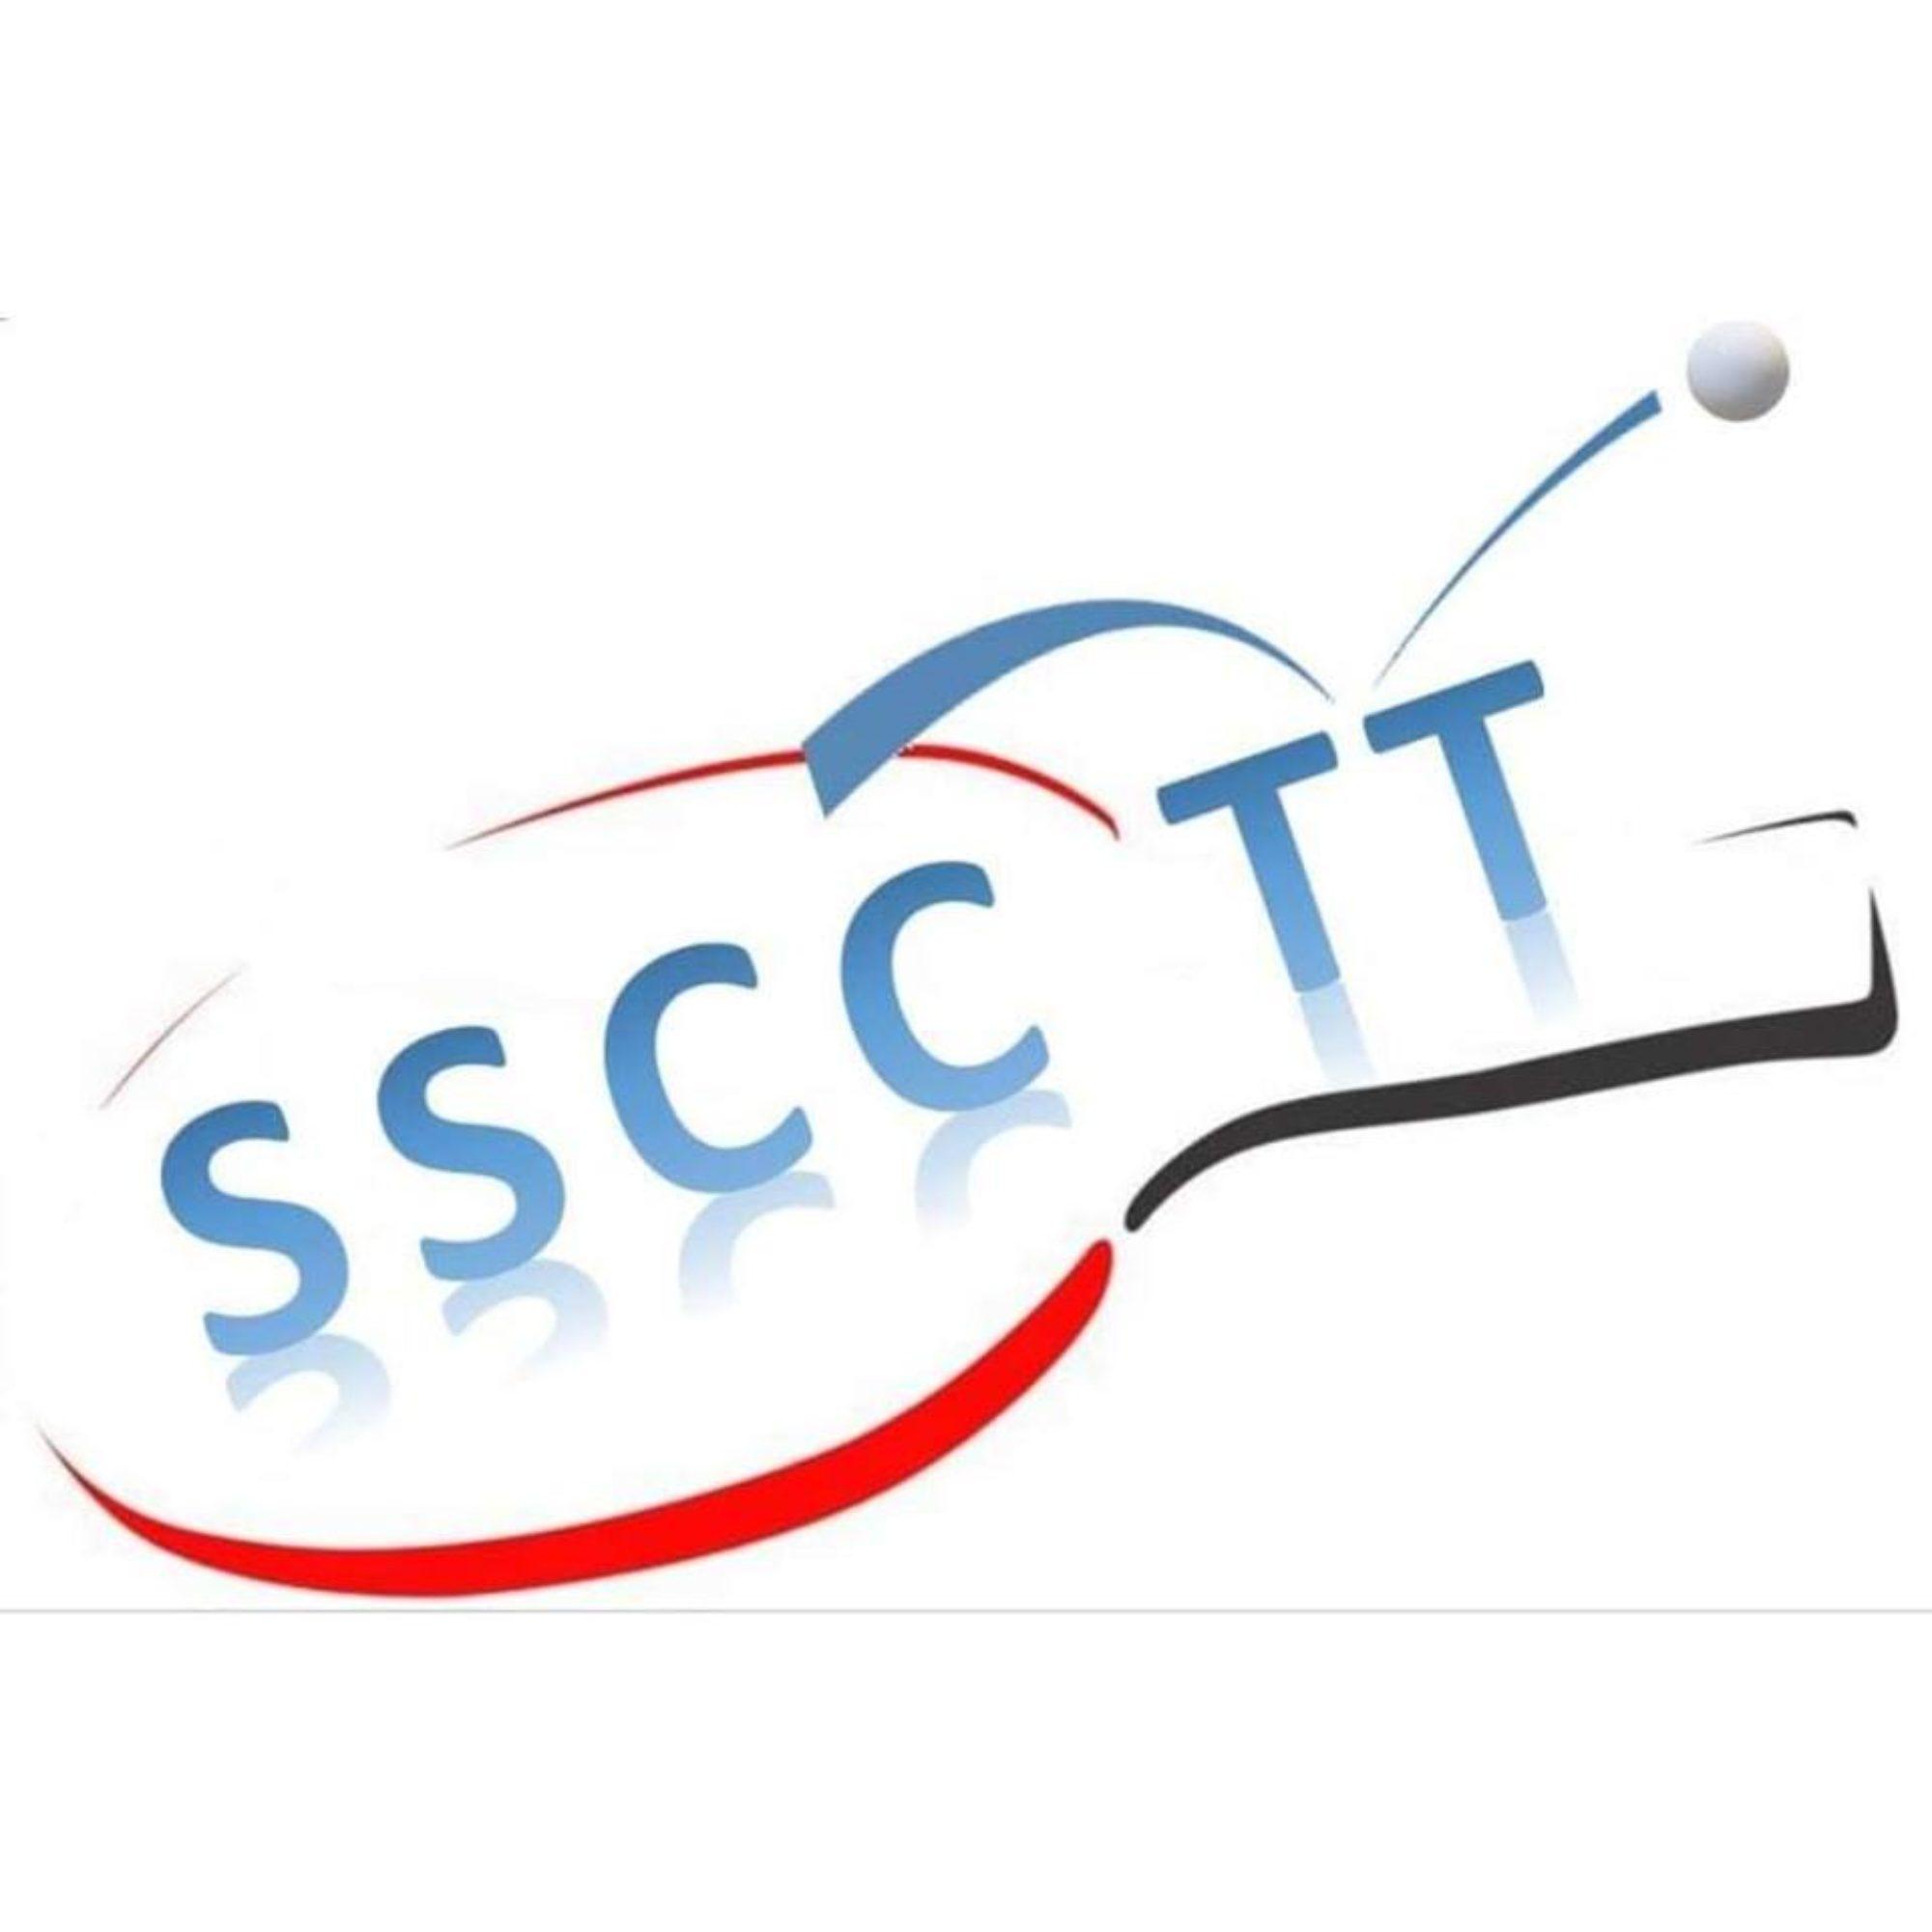 SSCC Tennis de table